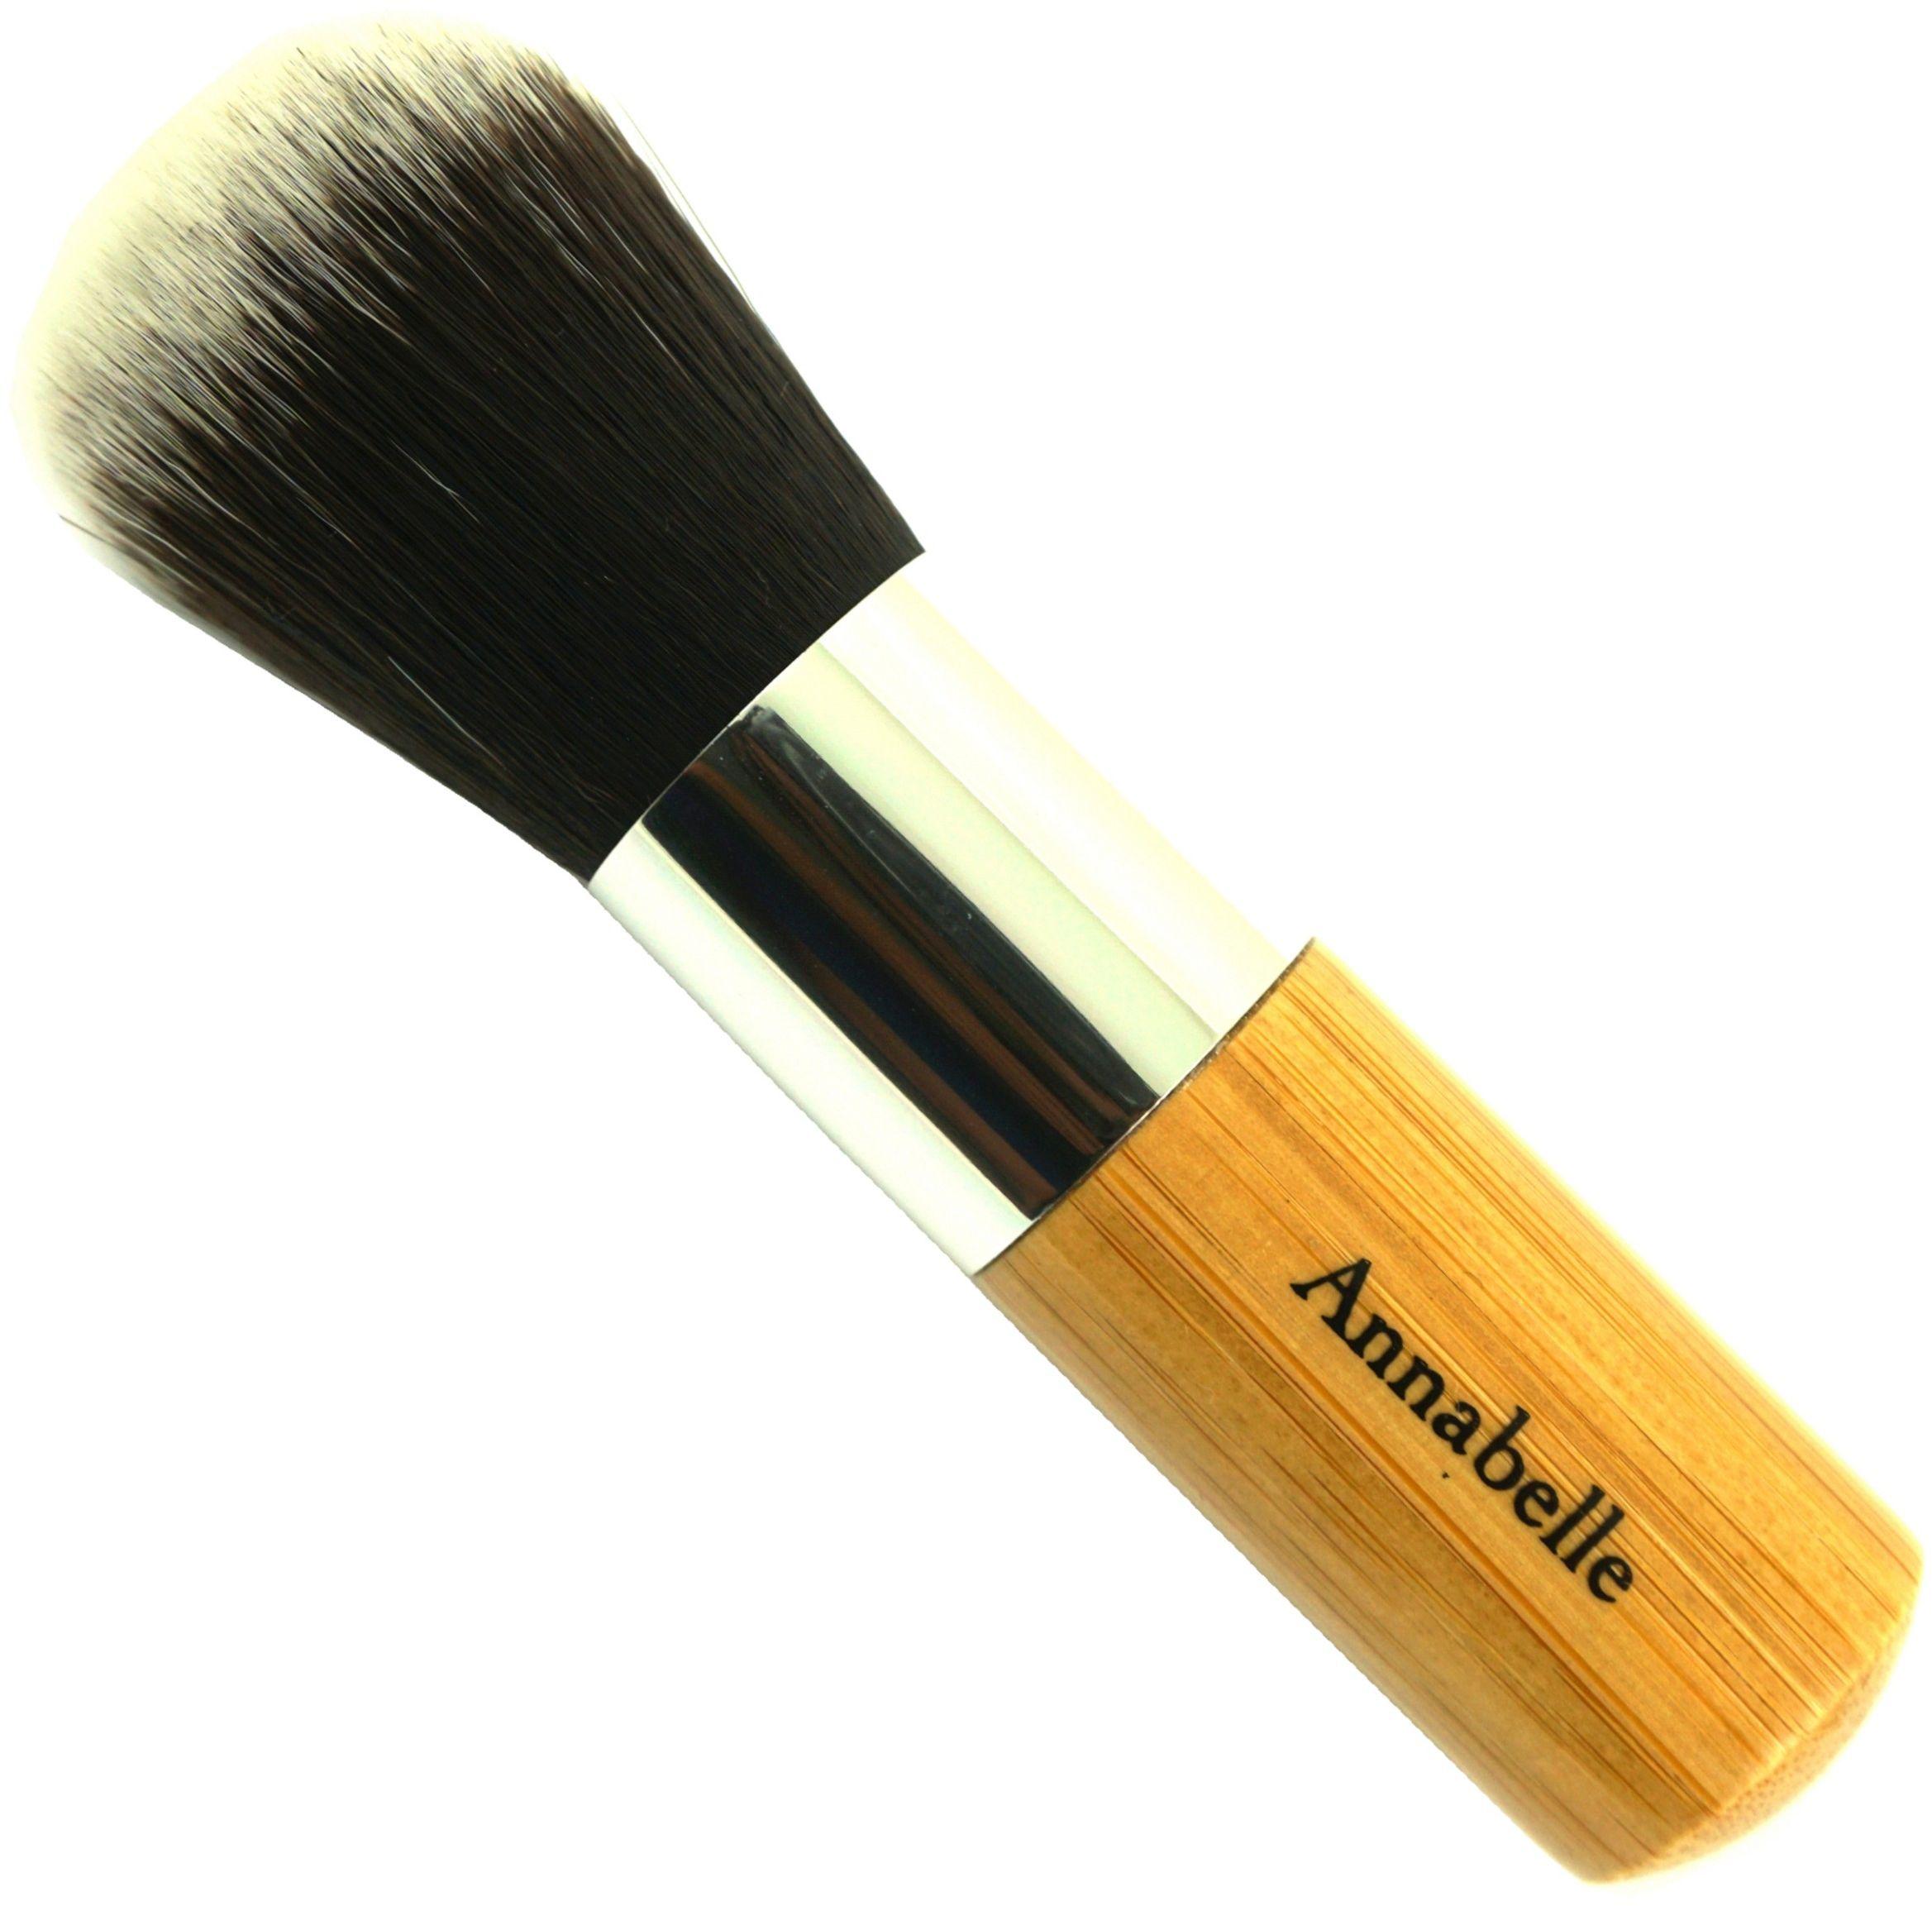 Pędzel Kabuki do podkładów mineralnych - Annabelle Minerals